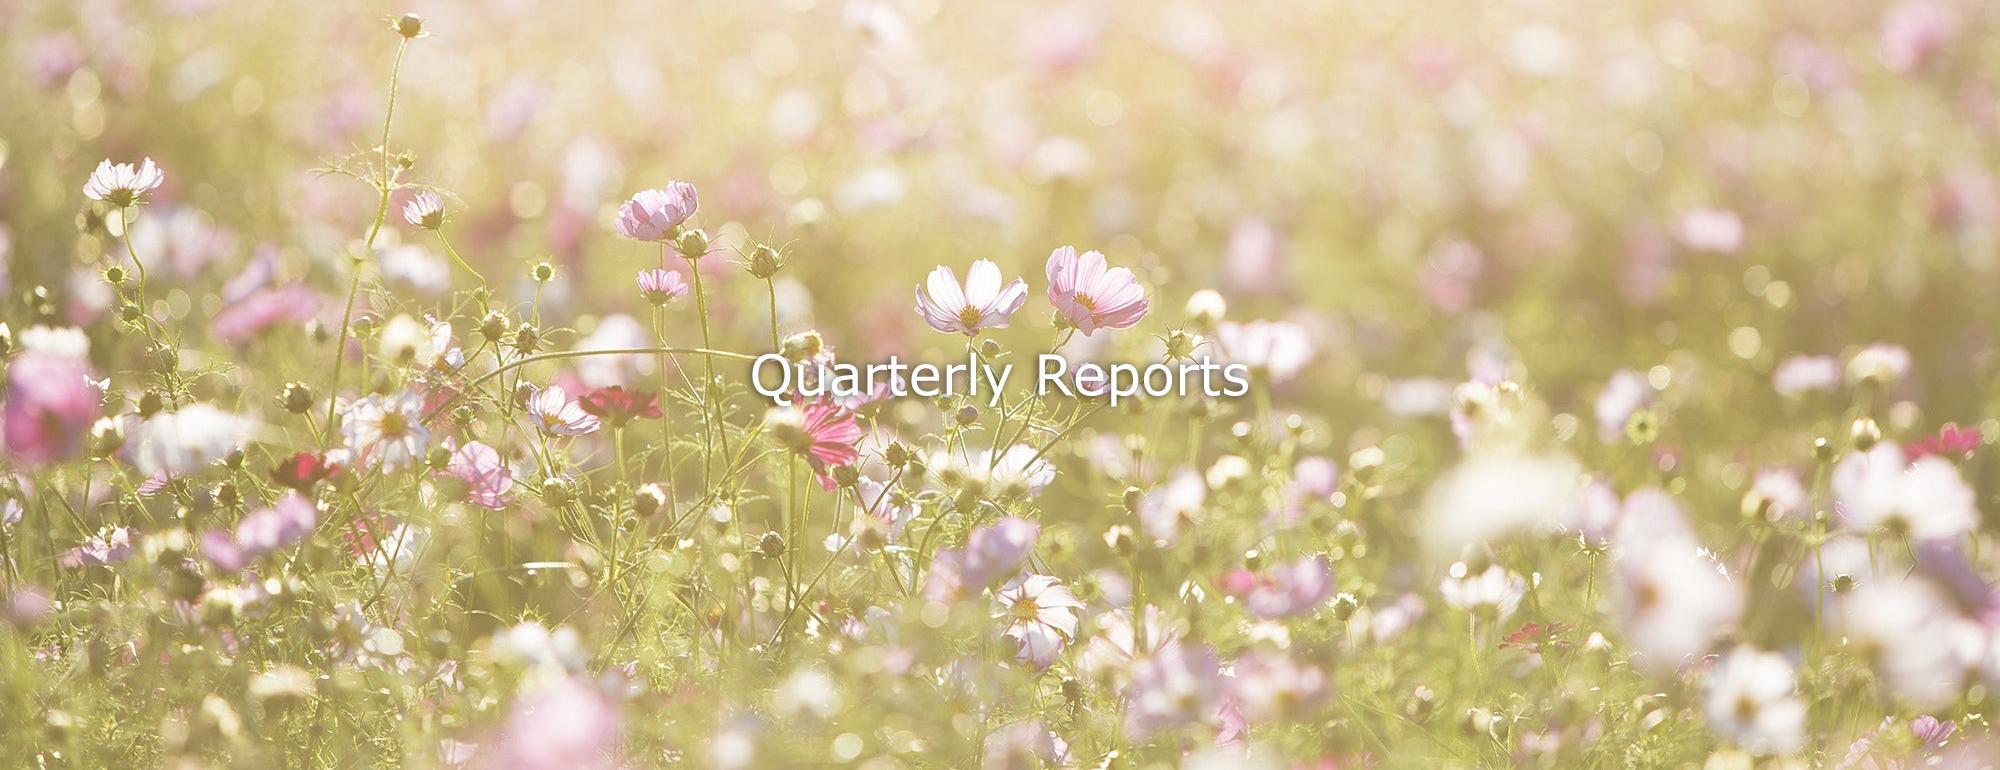 Quarterly Reports